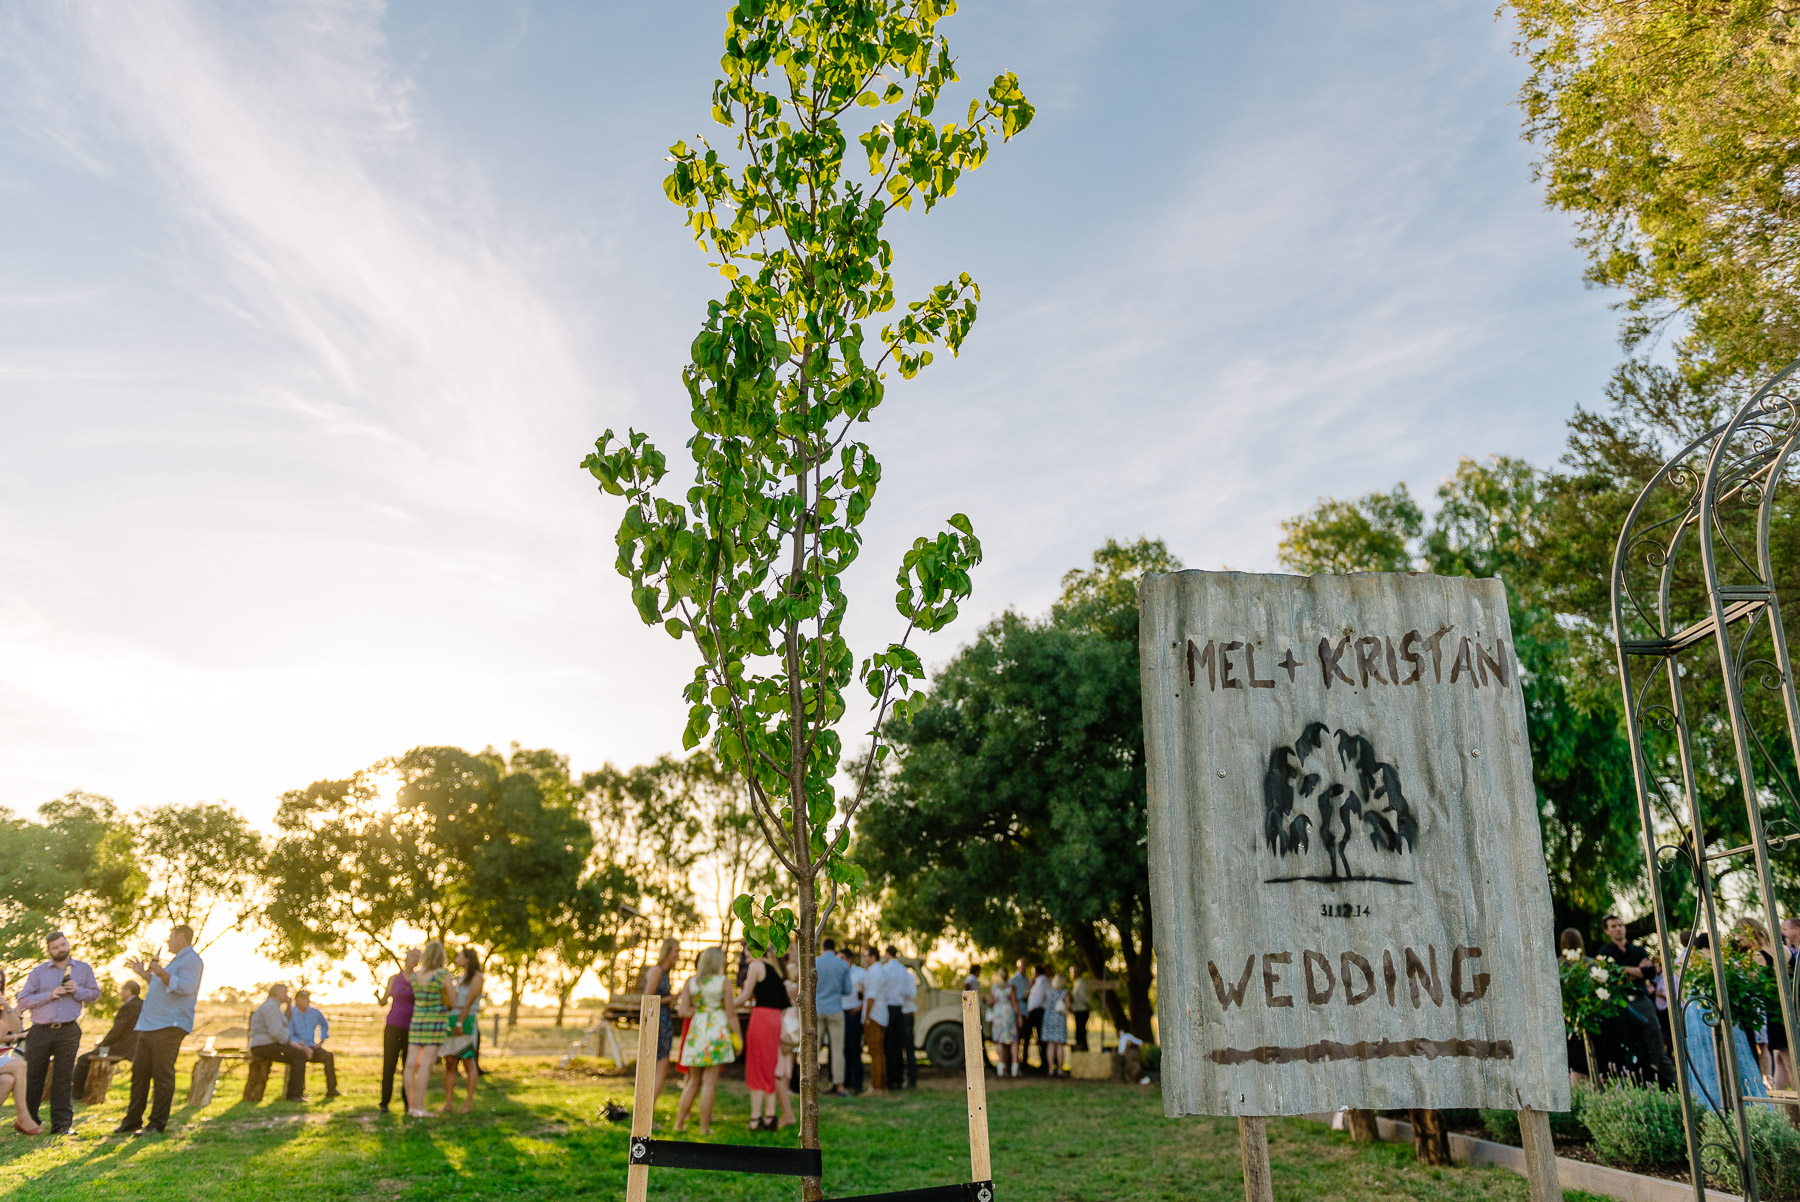 Melissa_and_Kristan_Echuca_Farm_Wedding_New_Years_Eve-95.jpg